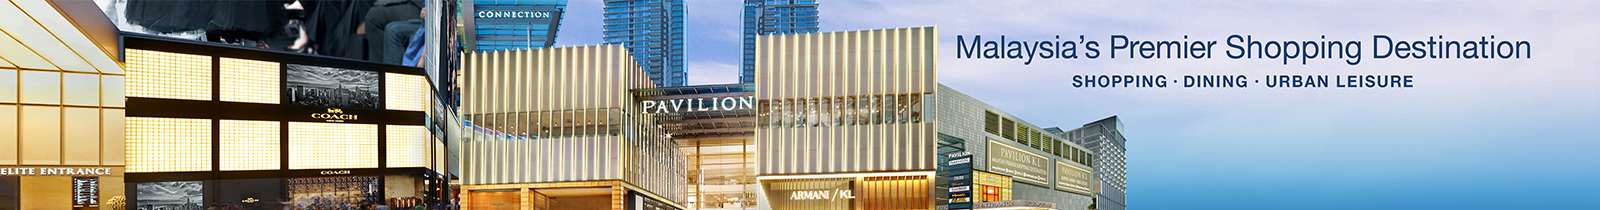 EXECUTIVE, DOCK LOGISTICS | Pavilion Kuala Lumpur